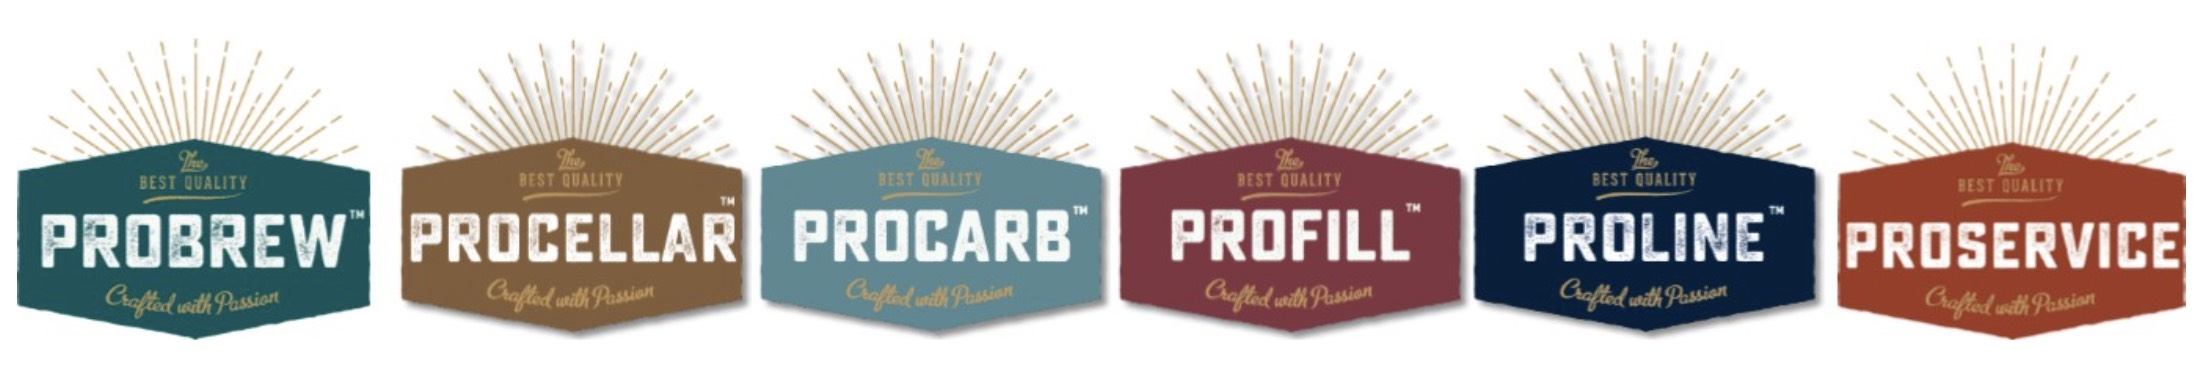 ProBrew Logos